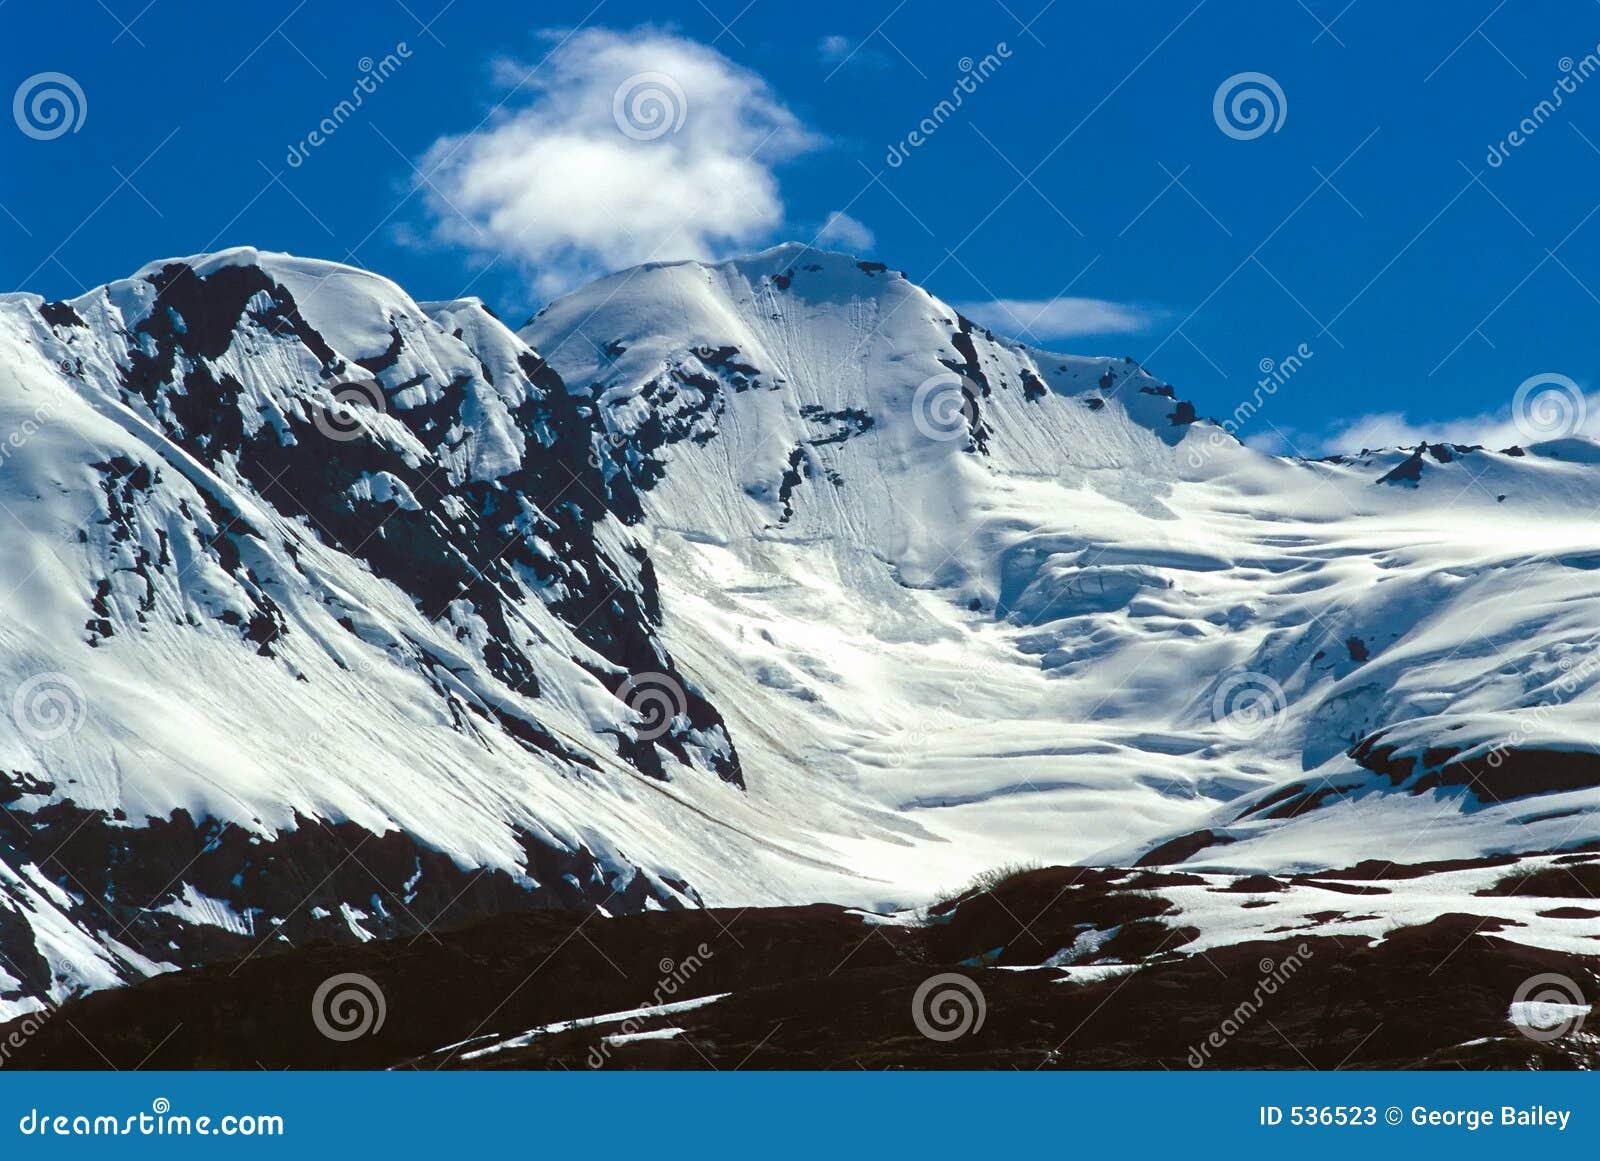 Alaska Mountains Stock Image Image Of Snow Wilderness